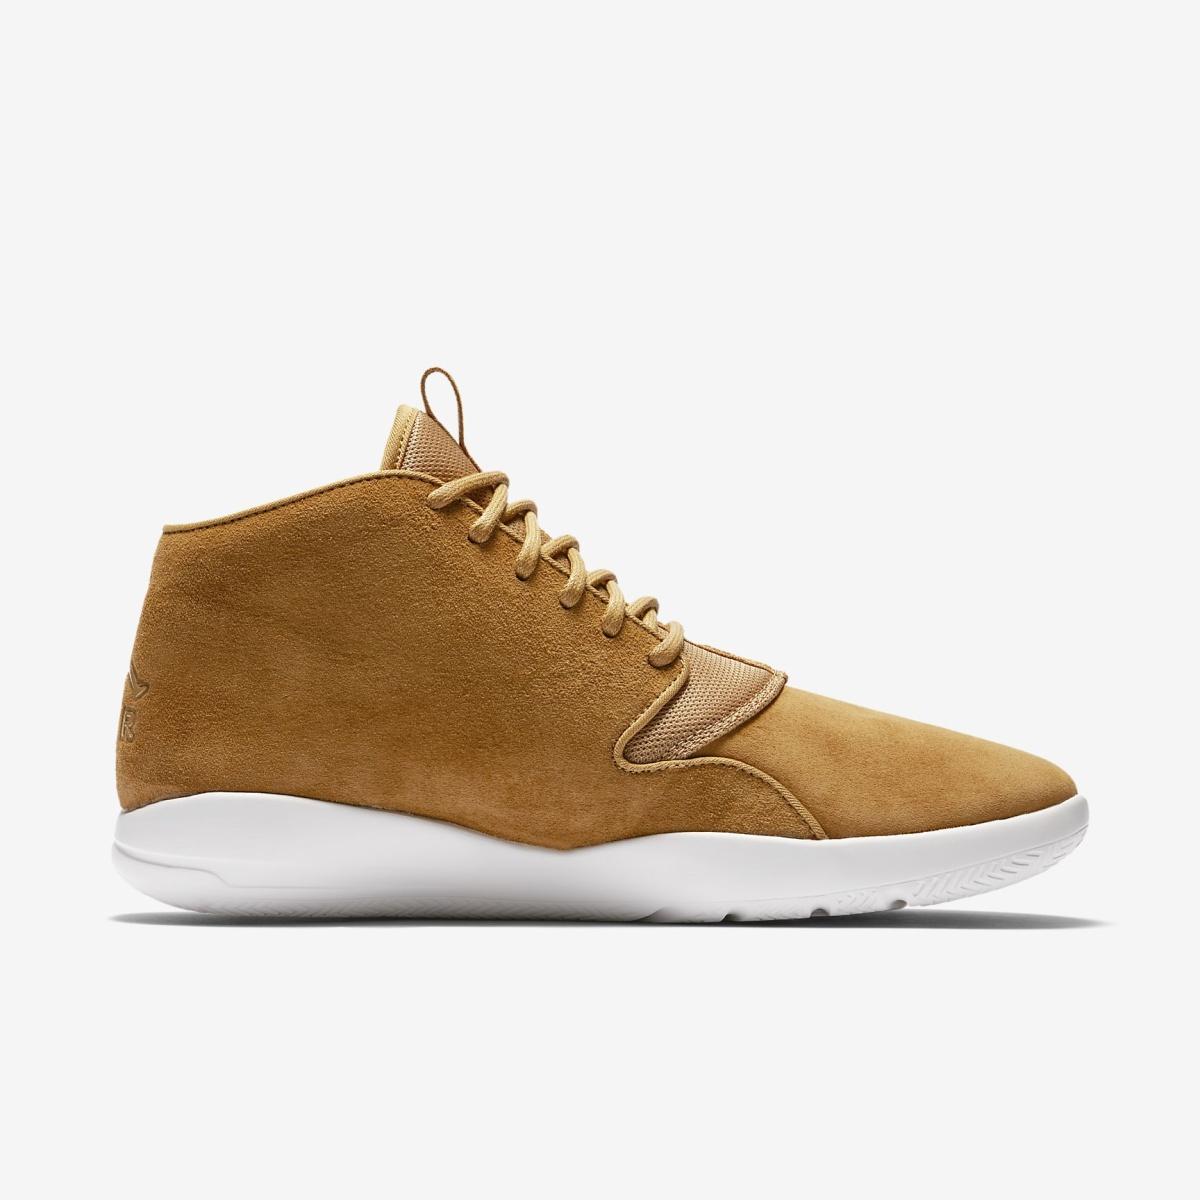 Nike Jordan Eclipse Chukka braun Sneaker Herren online bestellen